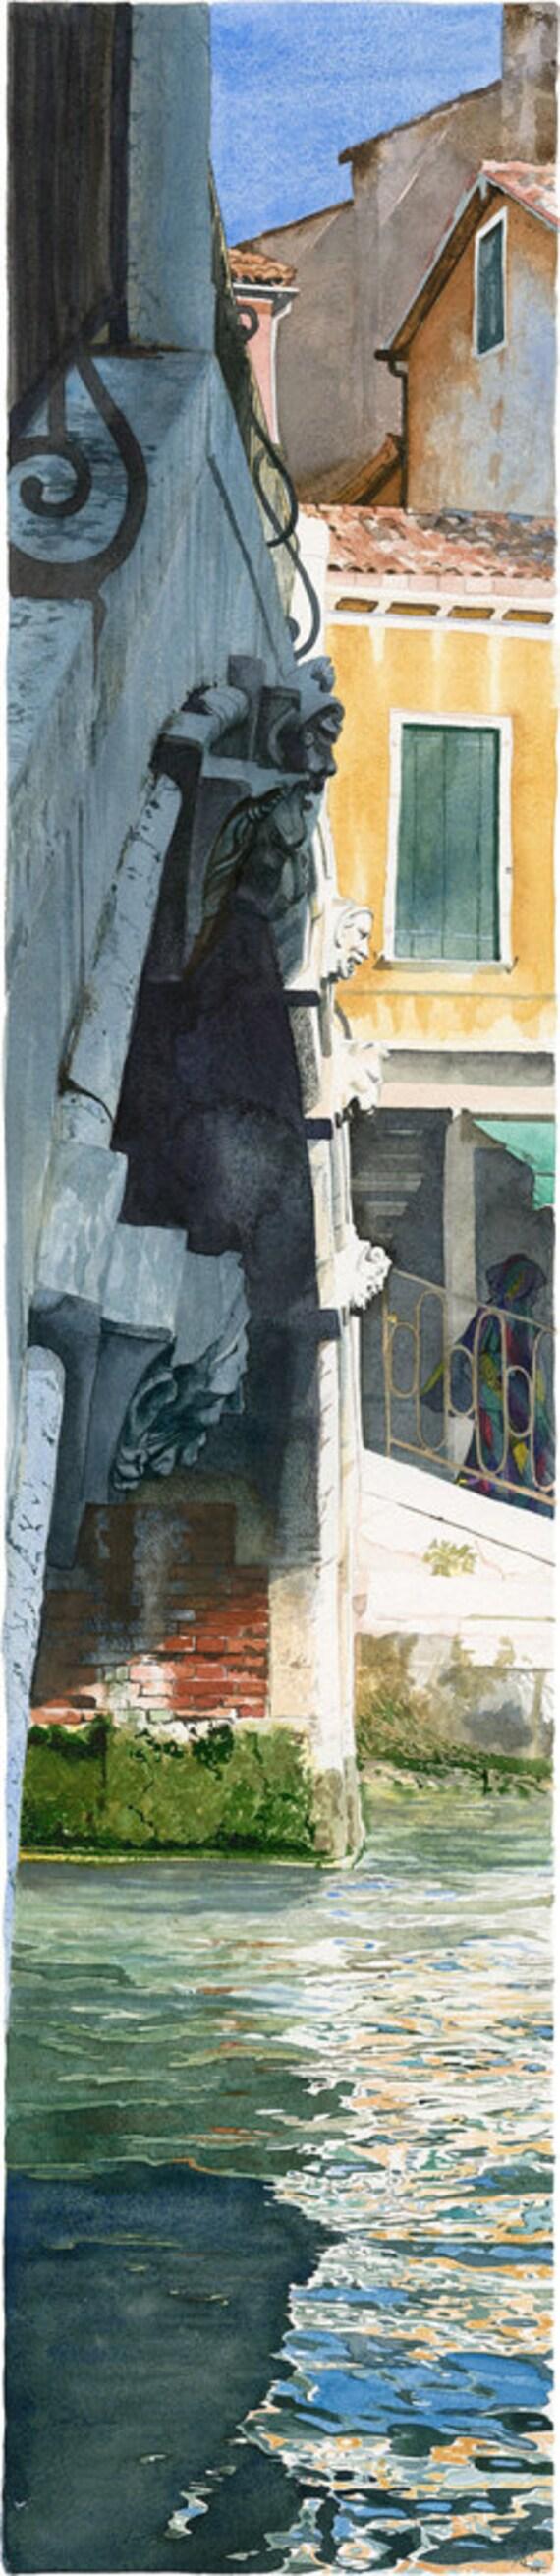 Venetian bridge with stone heads - Watercolour Giclée print